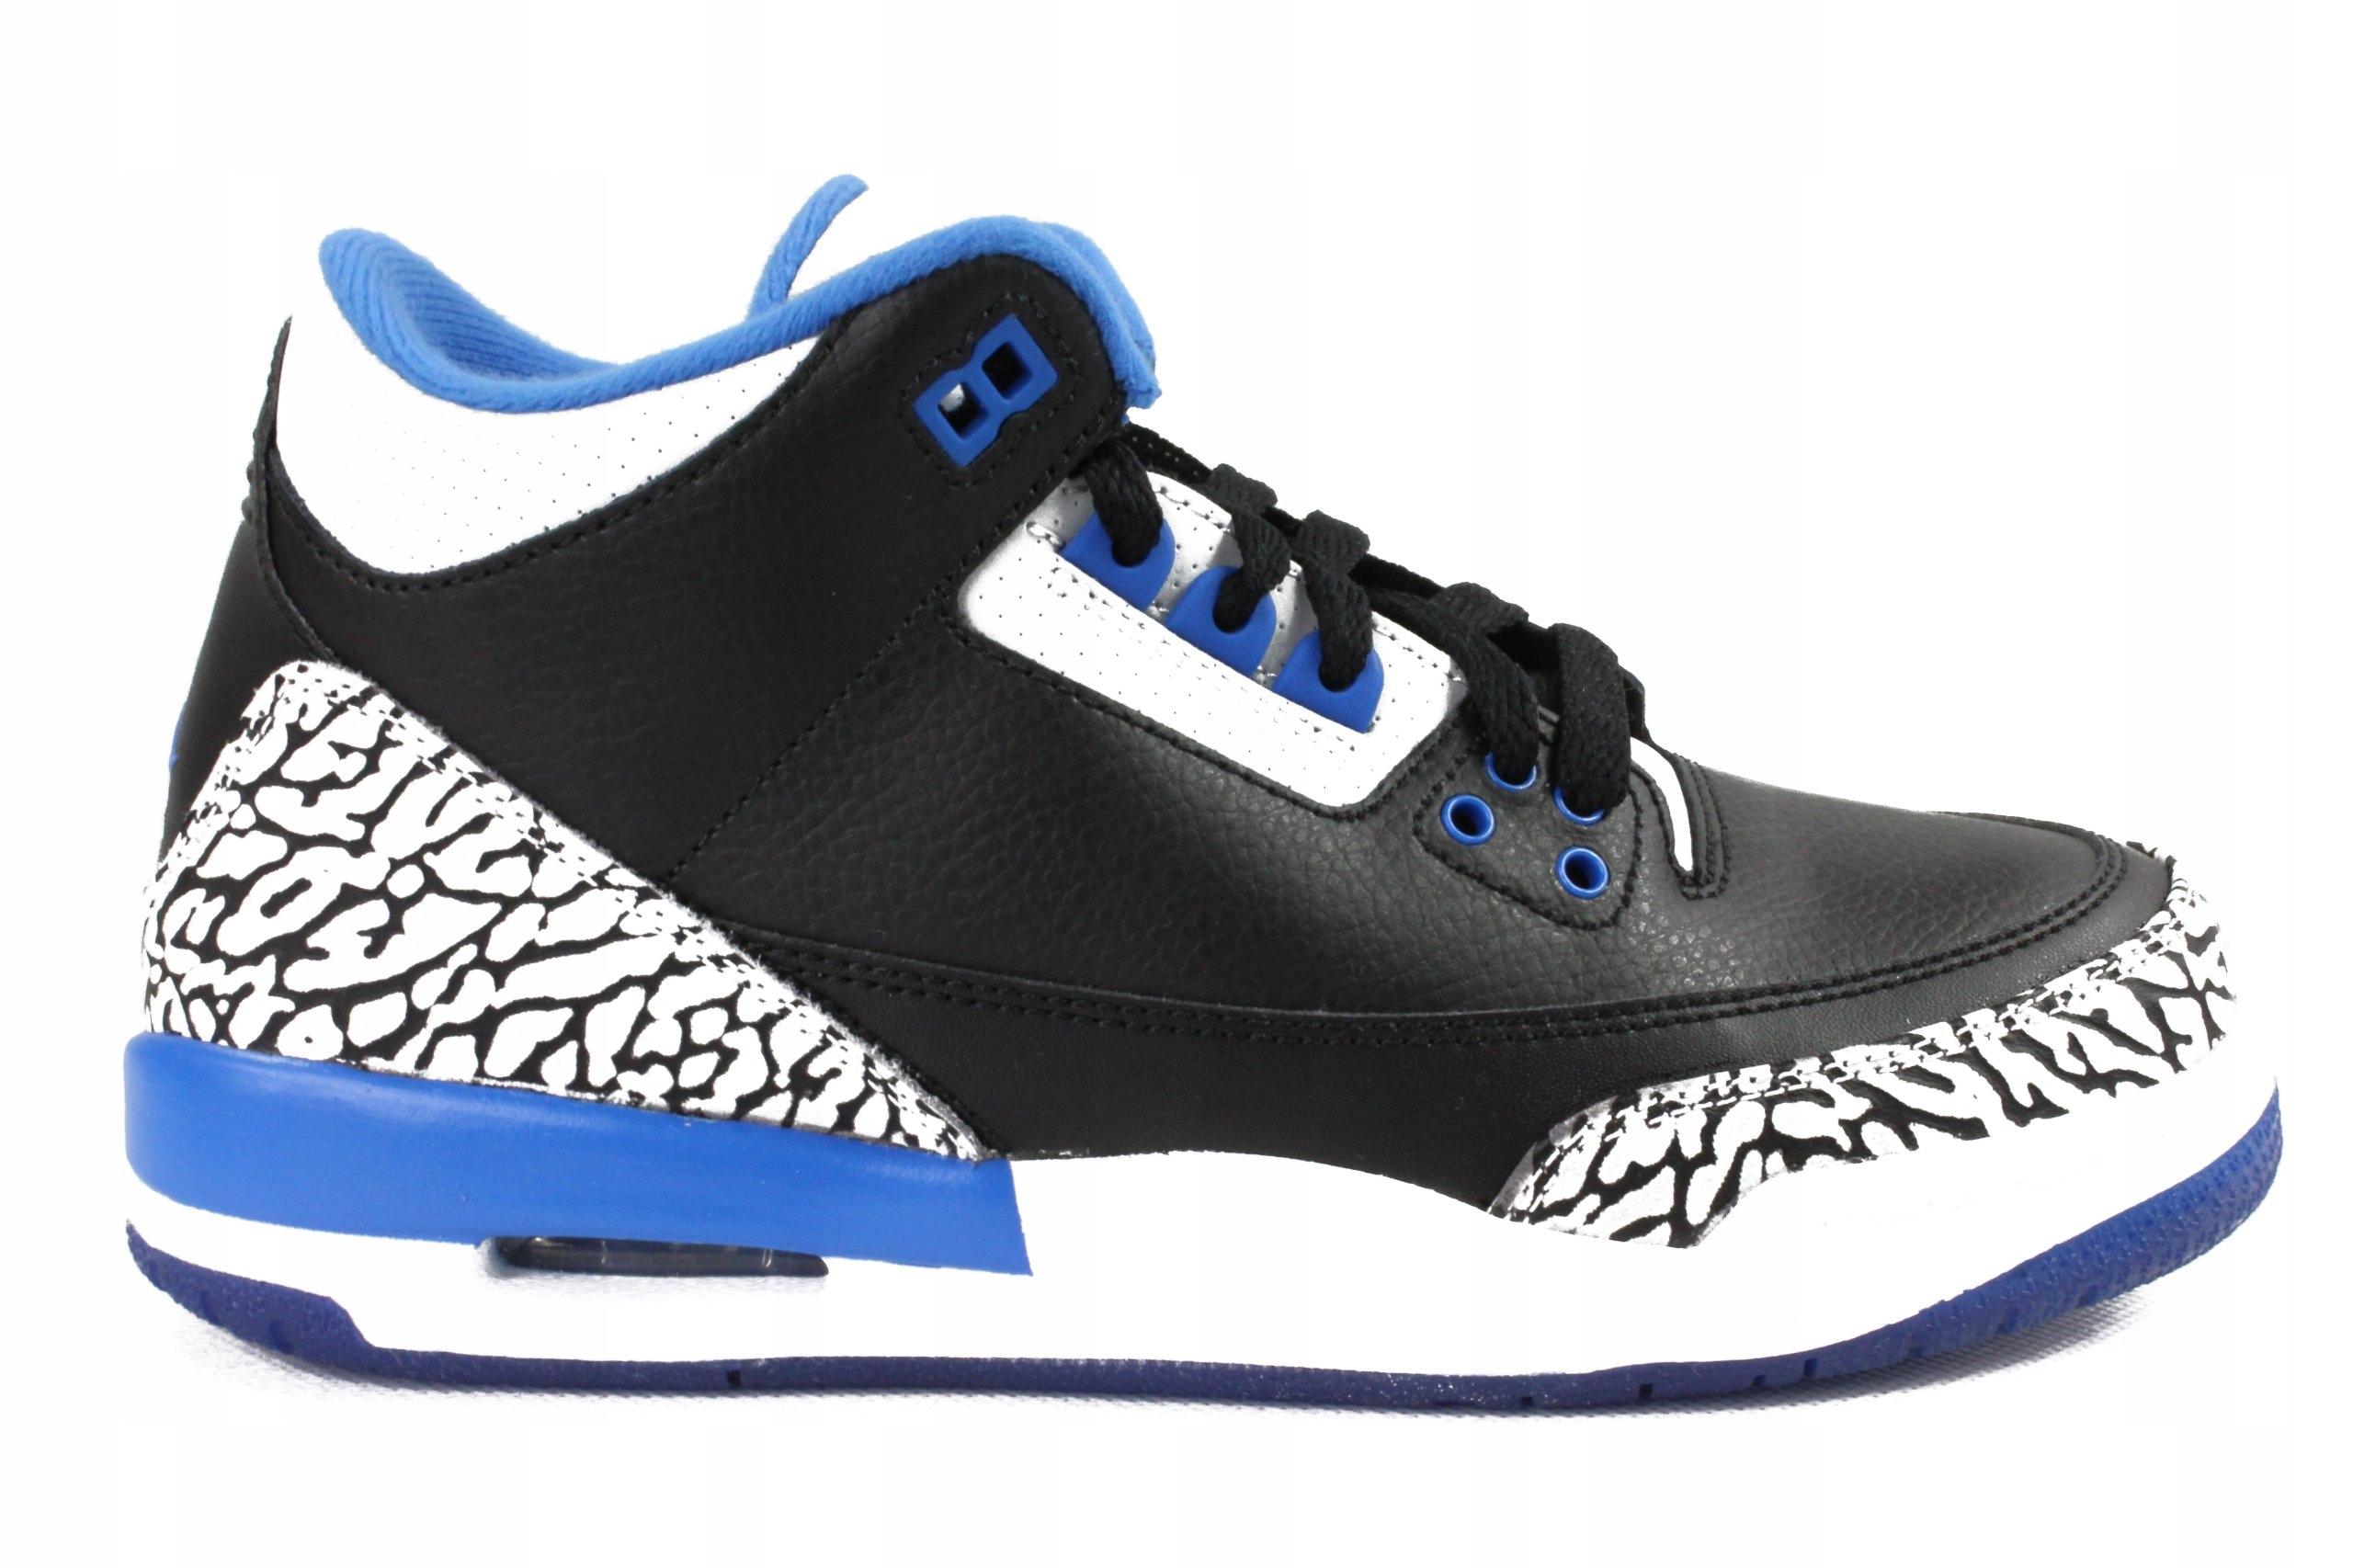 Buty Nike Air Jordan 3 Retro BG roz 36,5 Lebron Kd